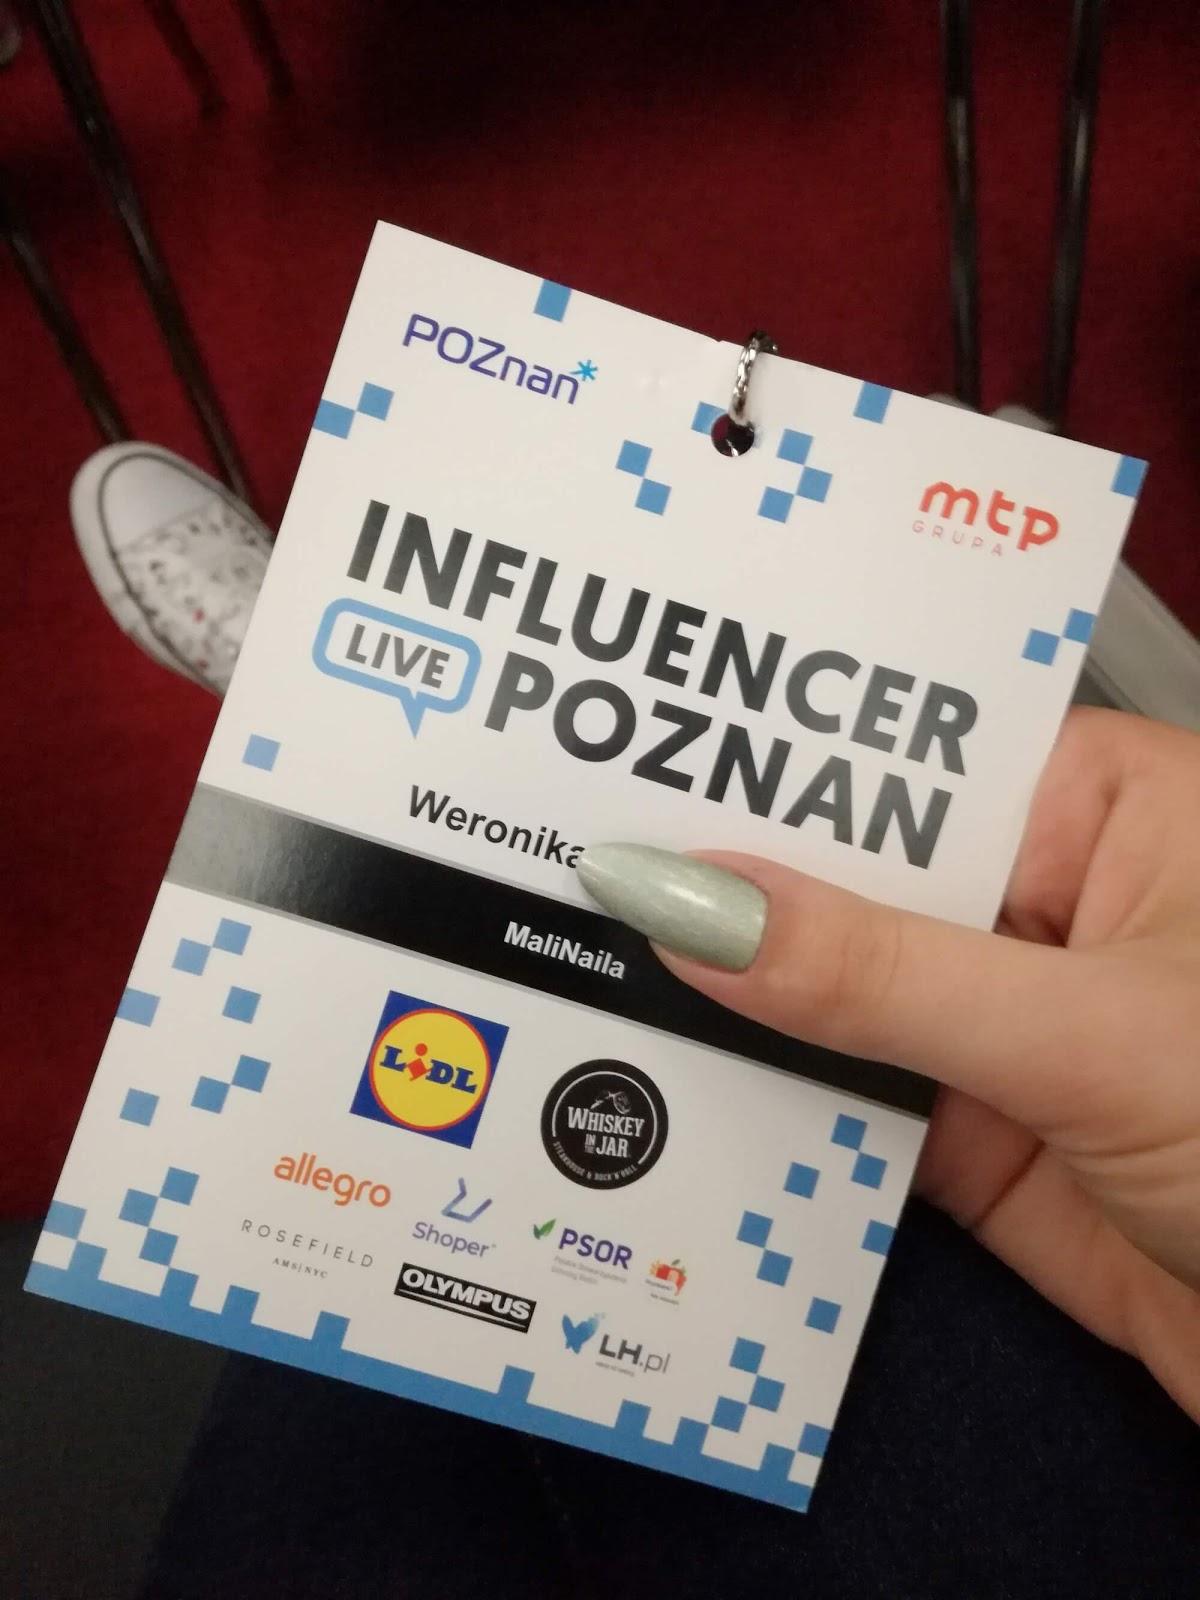 Influencer Live Poznań